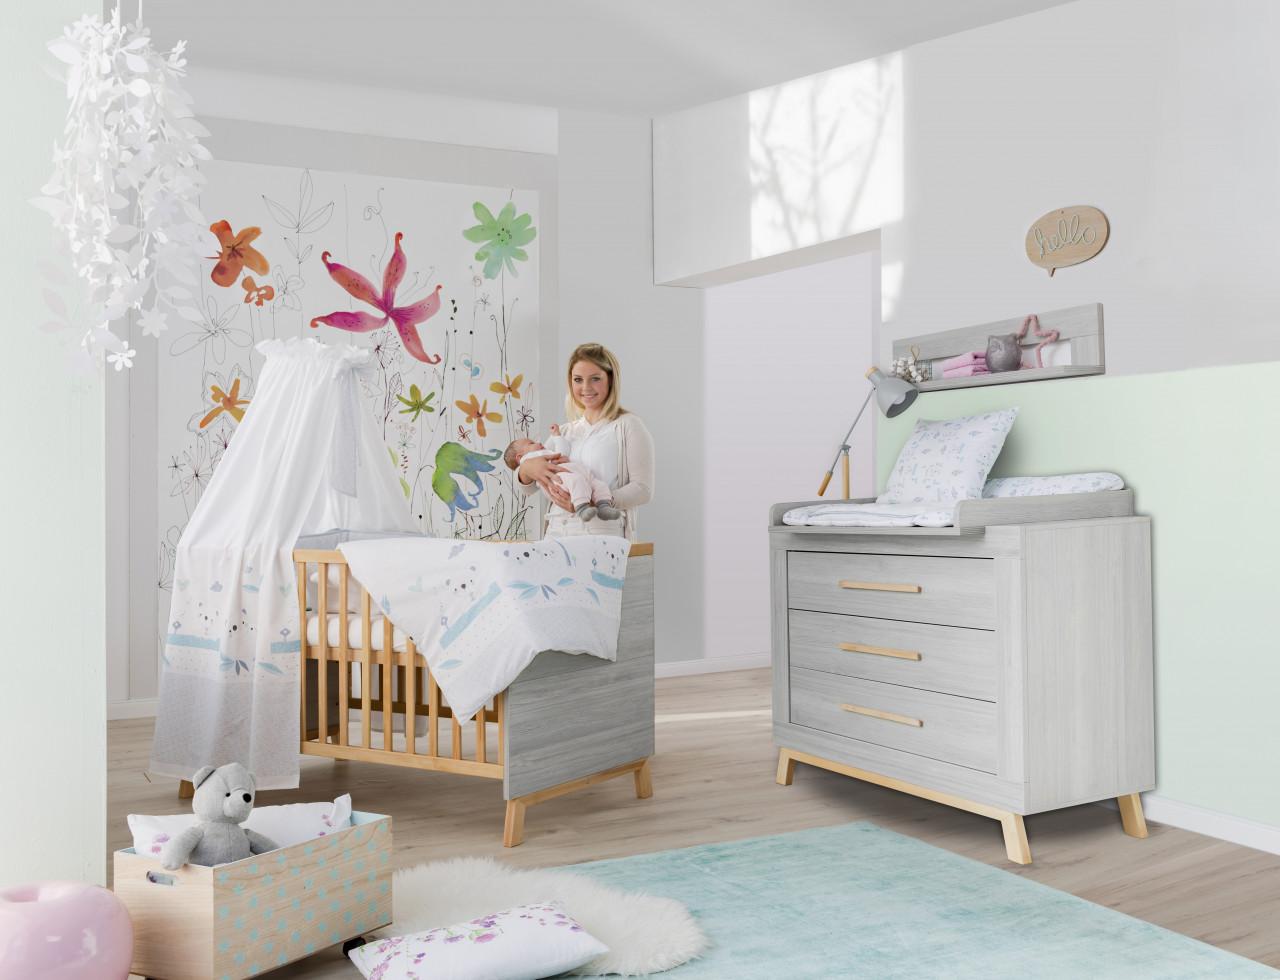 Schardt 'Miami Grey' 2-tlg. Babyzimmer-Set, grau Bild 1